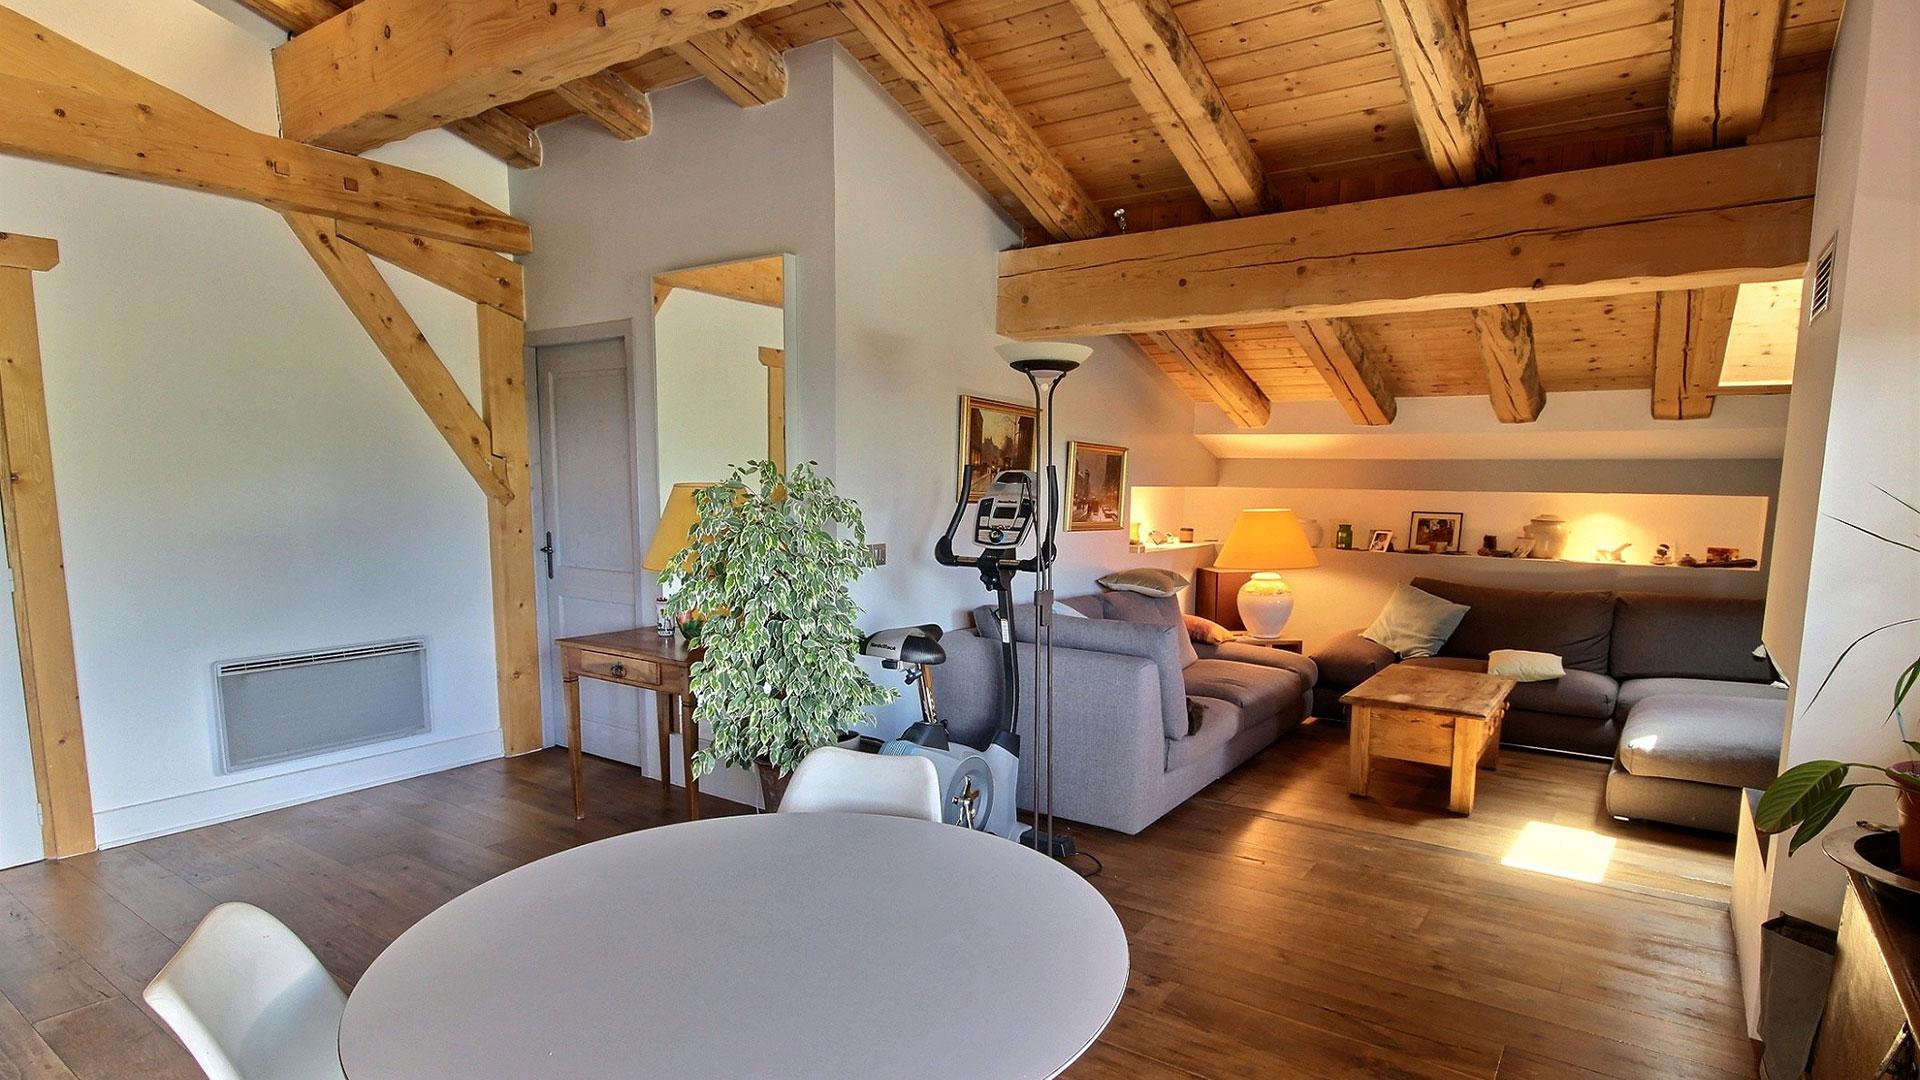 Laclos Apt Apartments, France